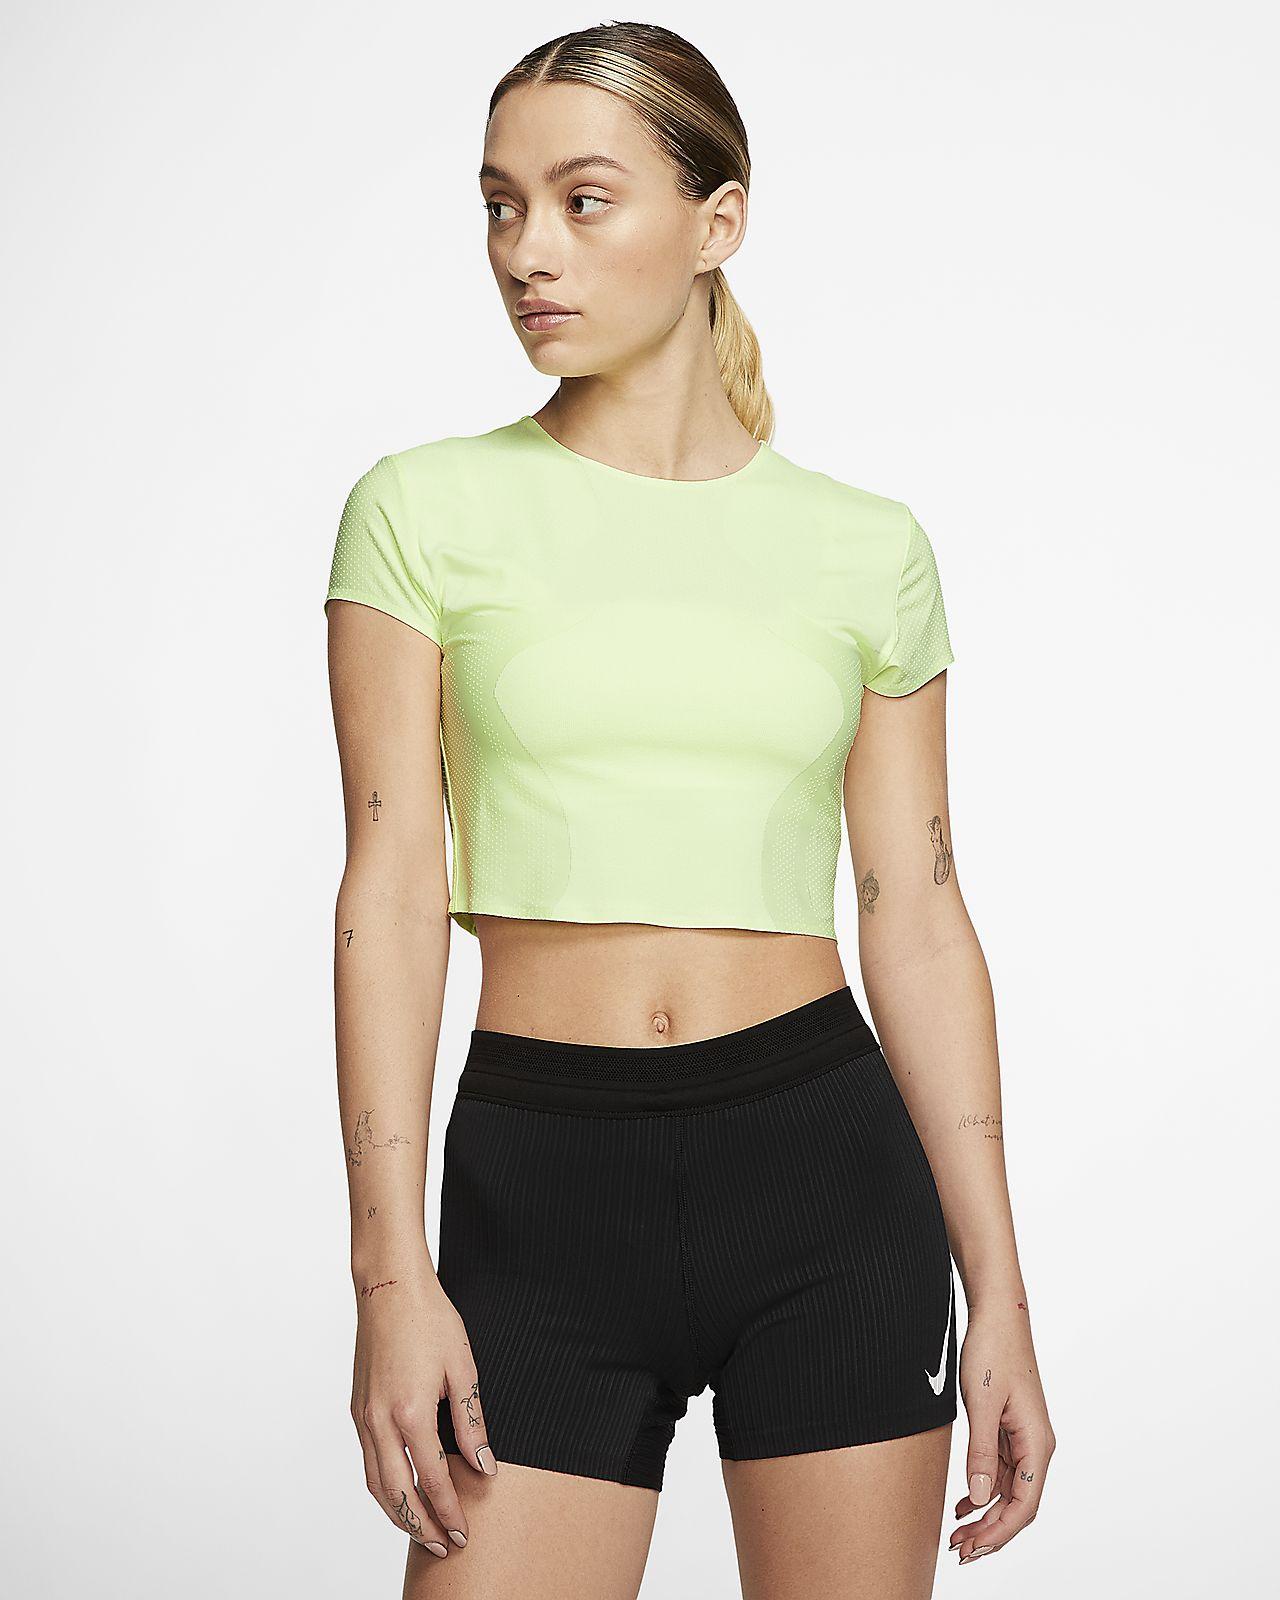 Nike City Ready Run-løbetop til kvinder